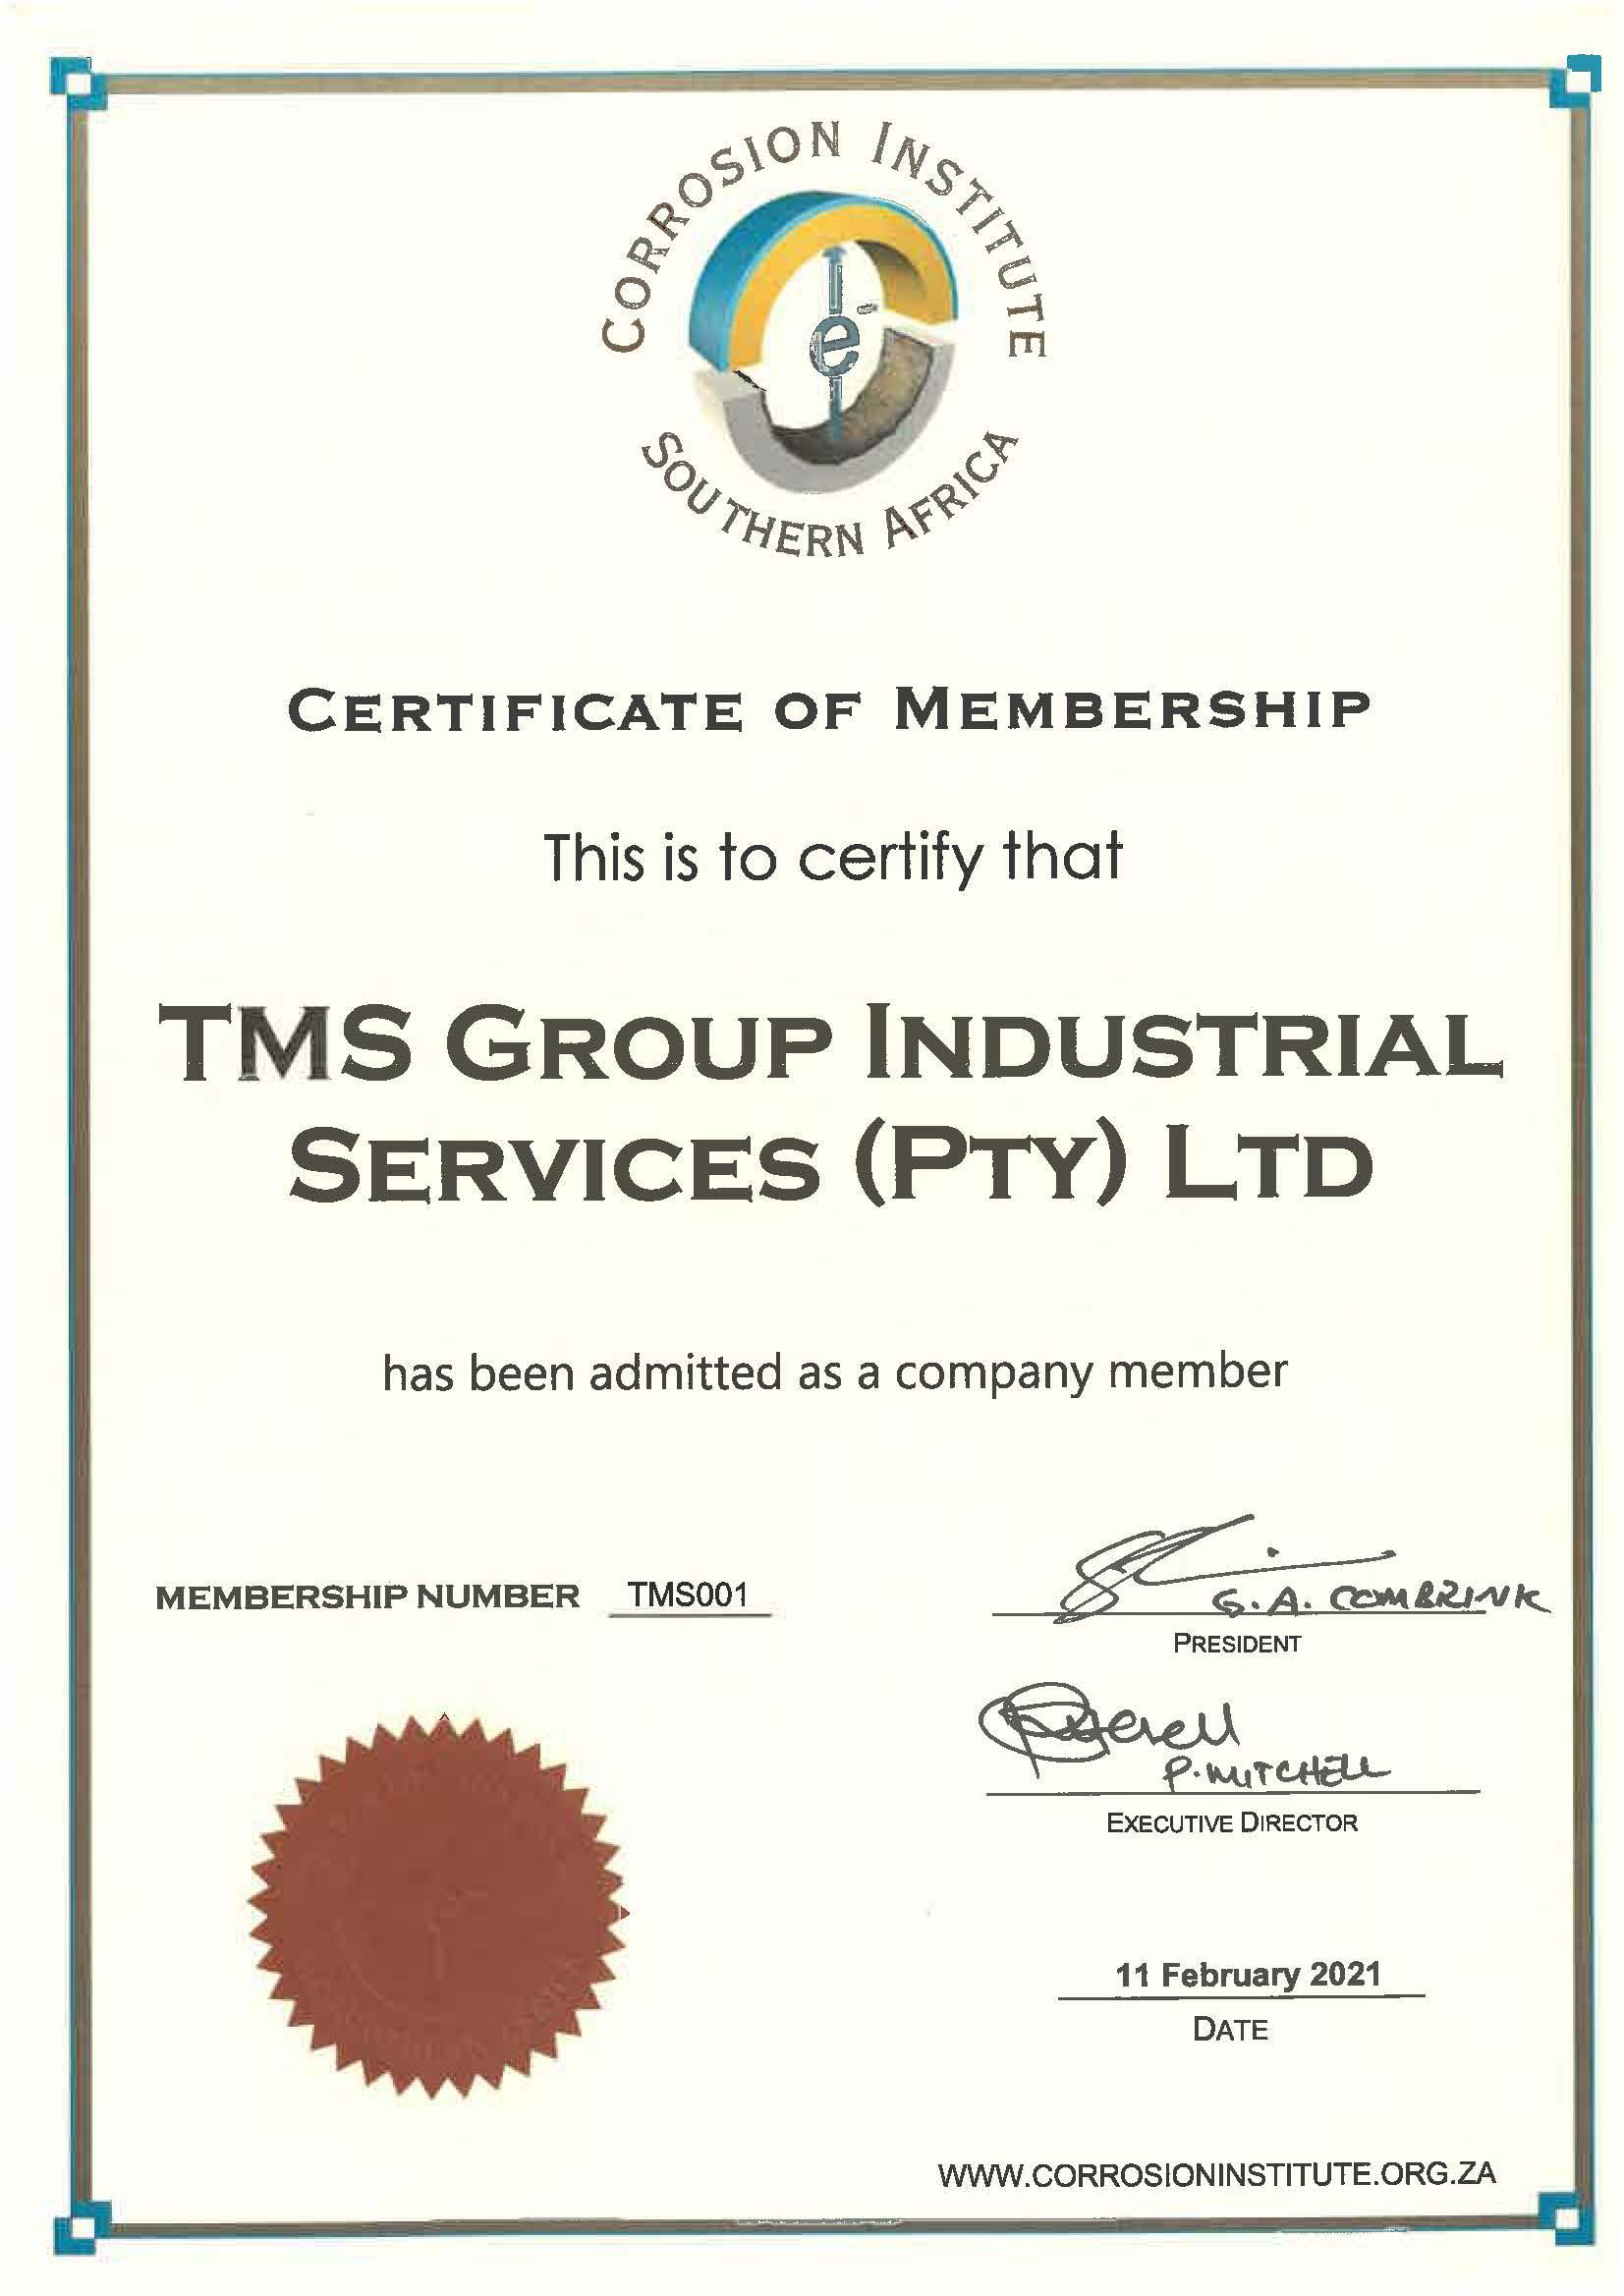 Corrosion Institute Membership